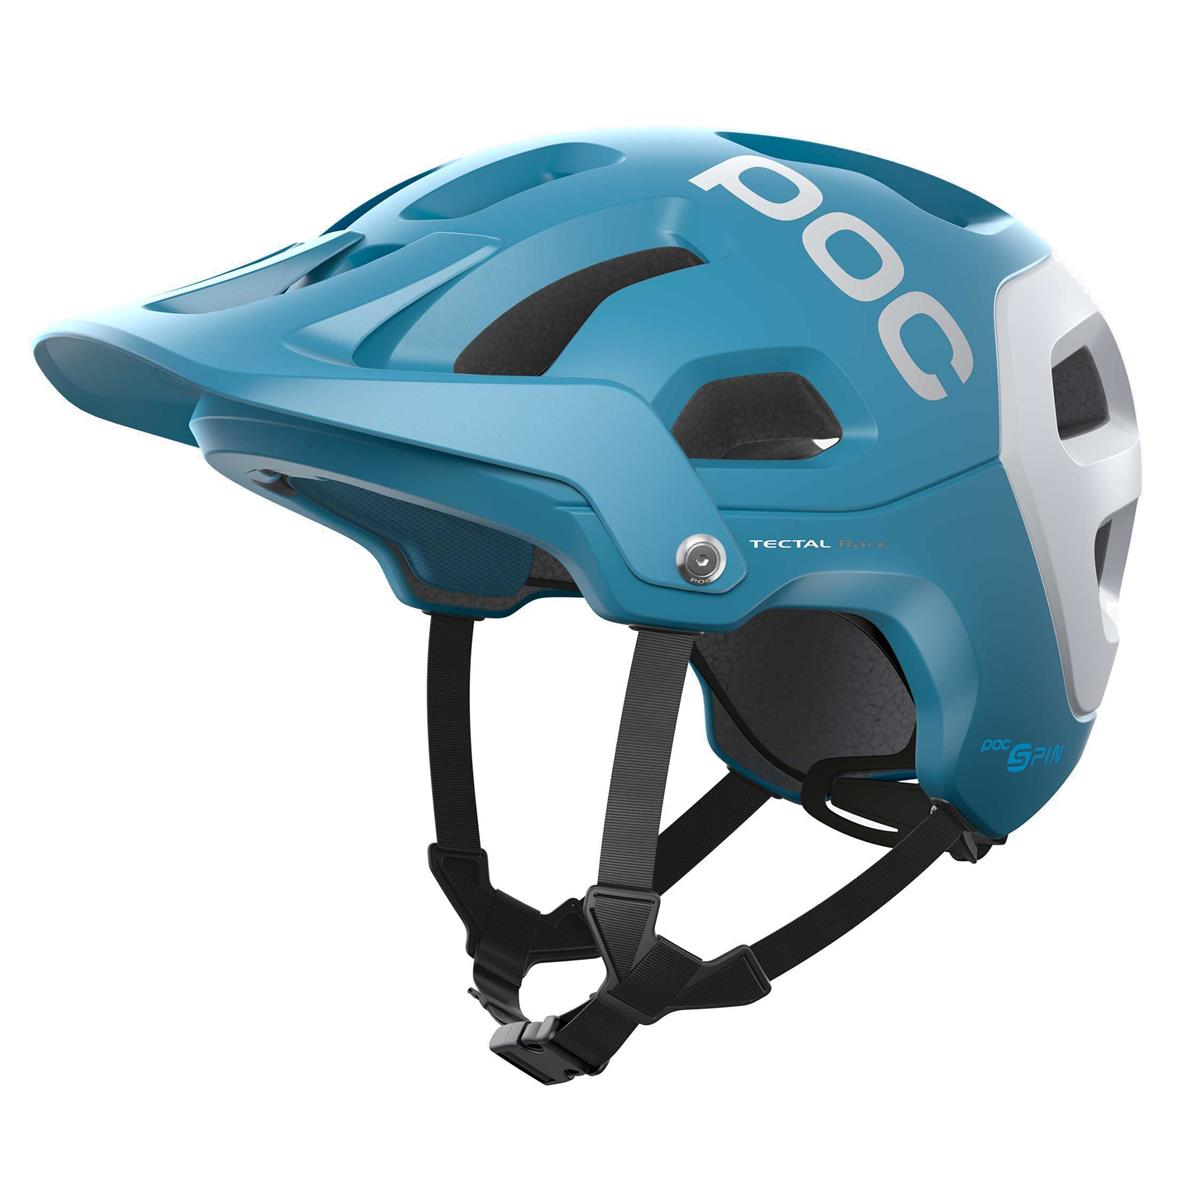 Enduro Helmet Tectal Race Spin Light Blue Size XS-S (51-54cm)